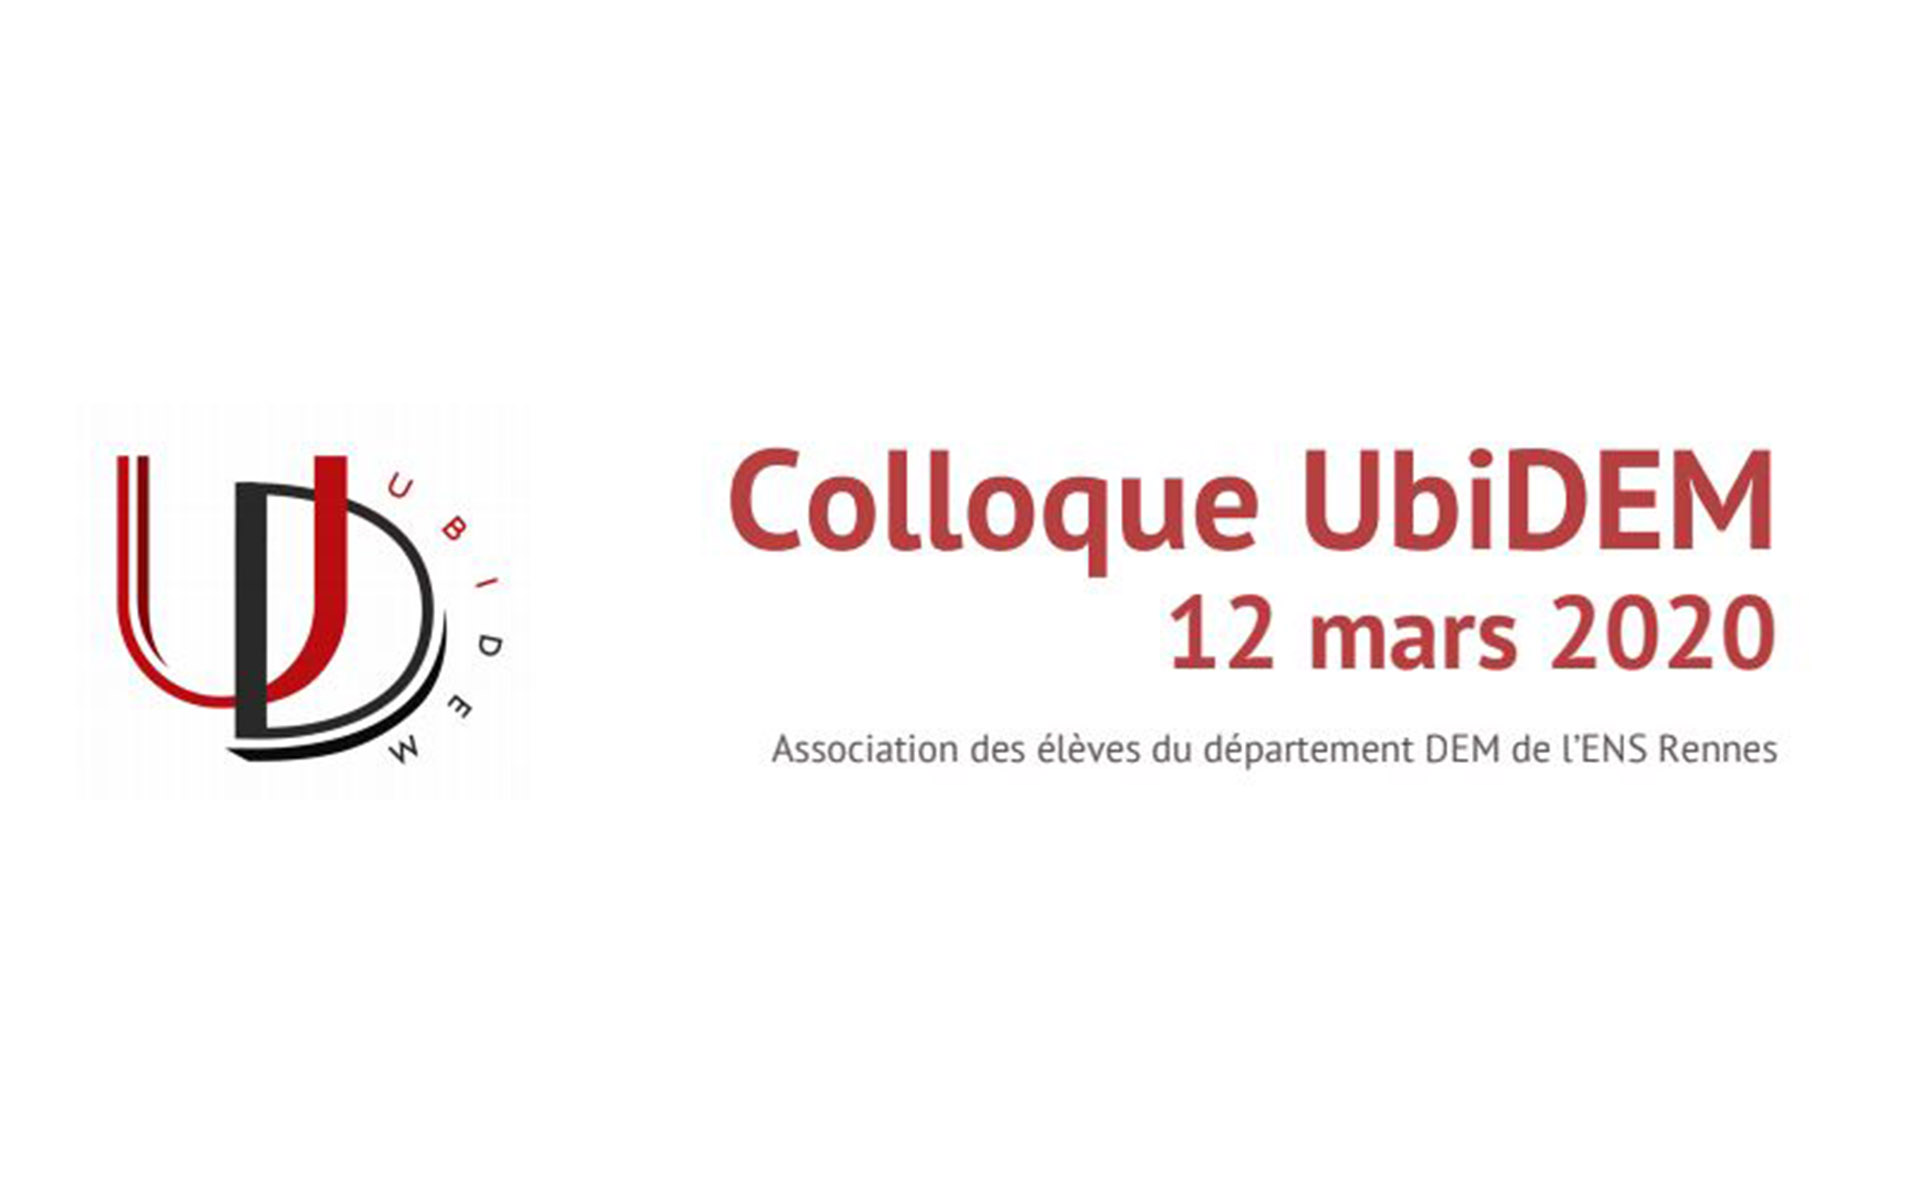 Colloque UbiDEM – 12 mars 2020